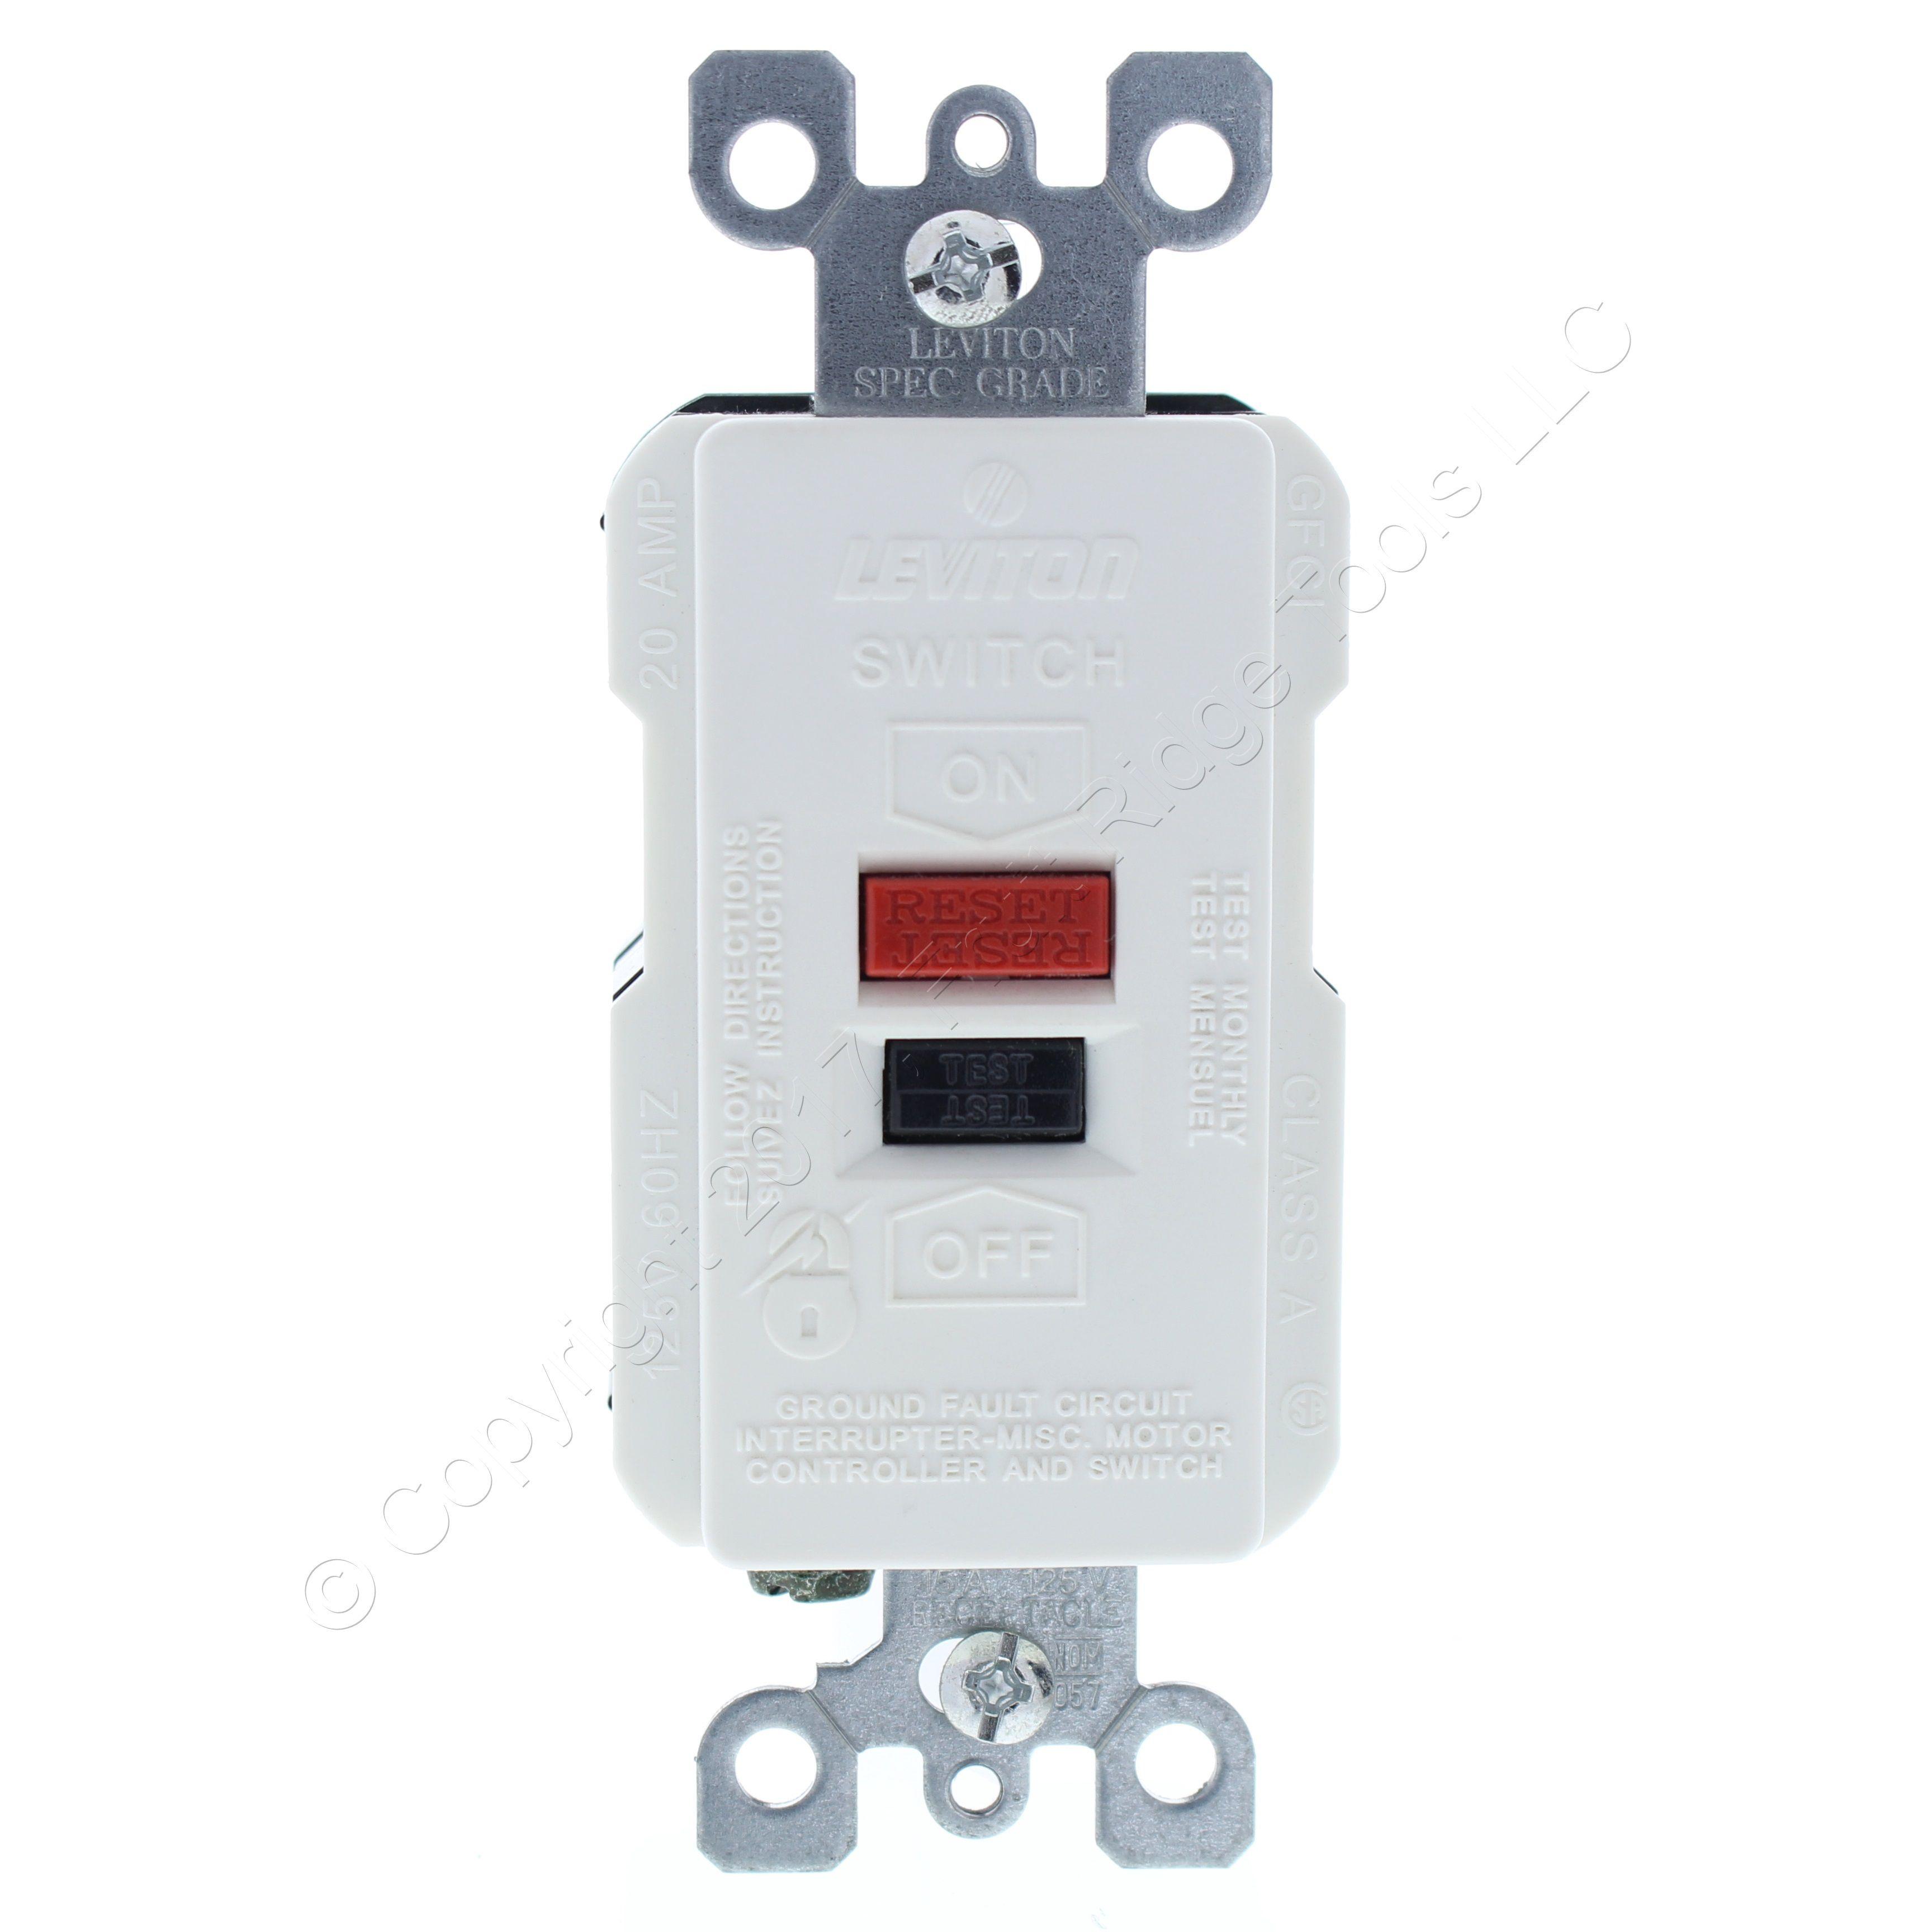 Wiring Ground Fault Circuit Interrupter Switch